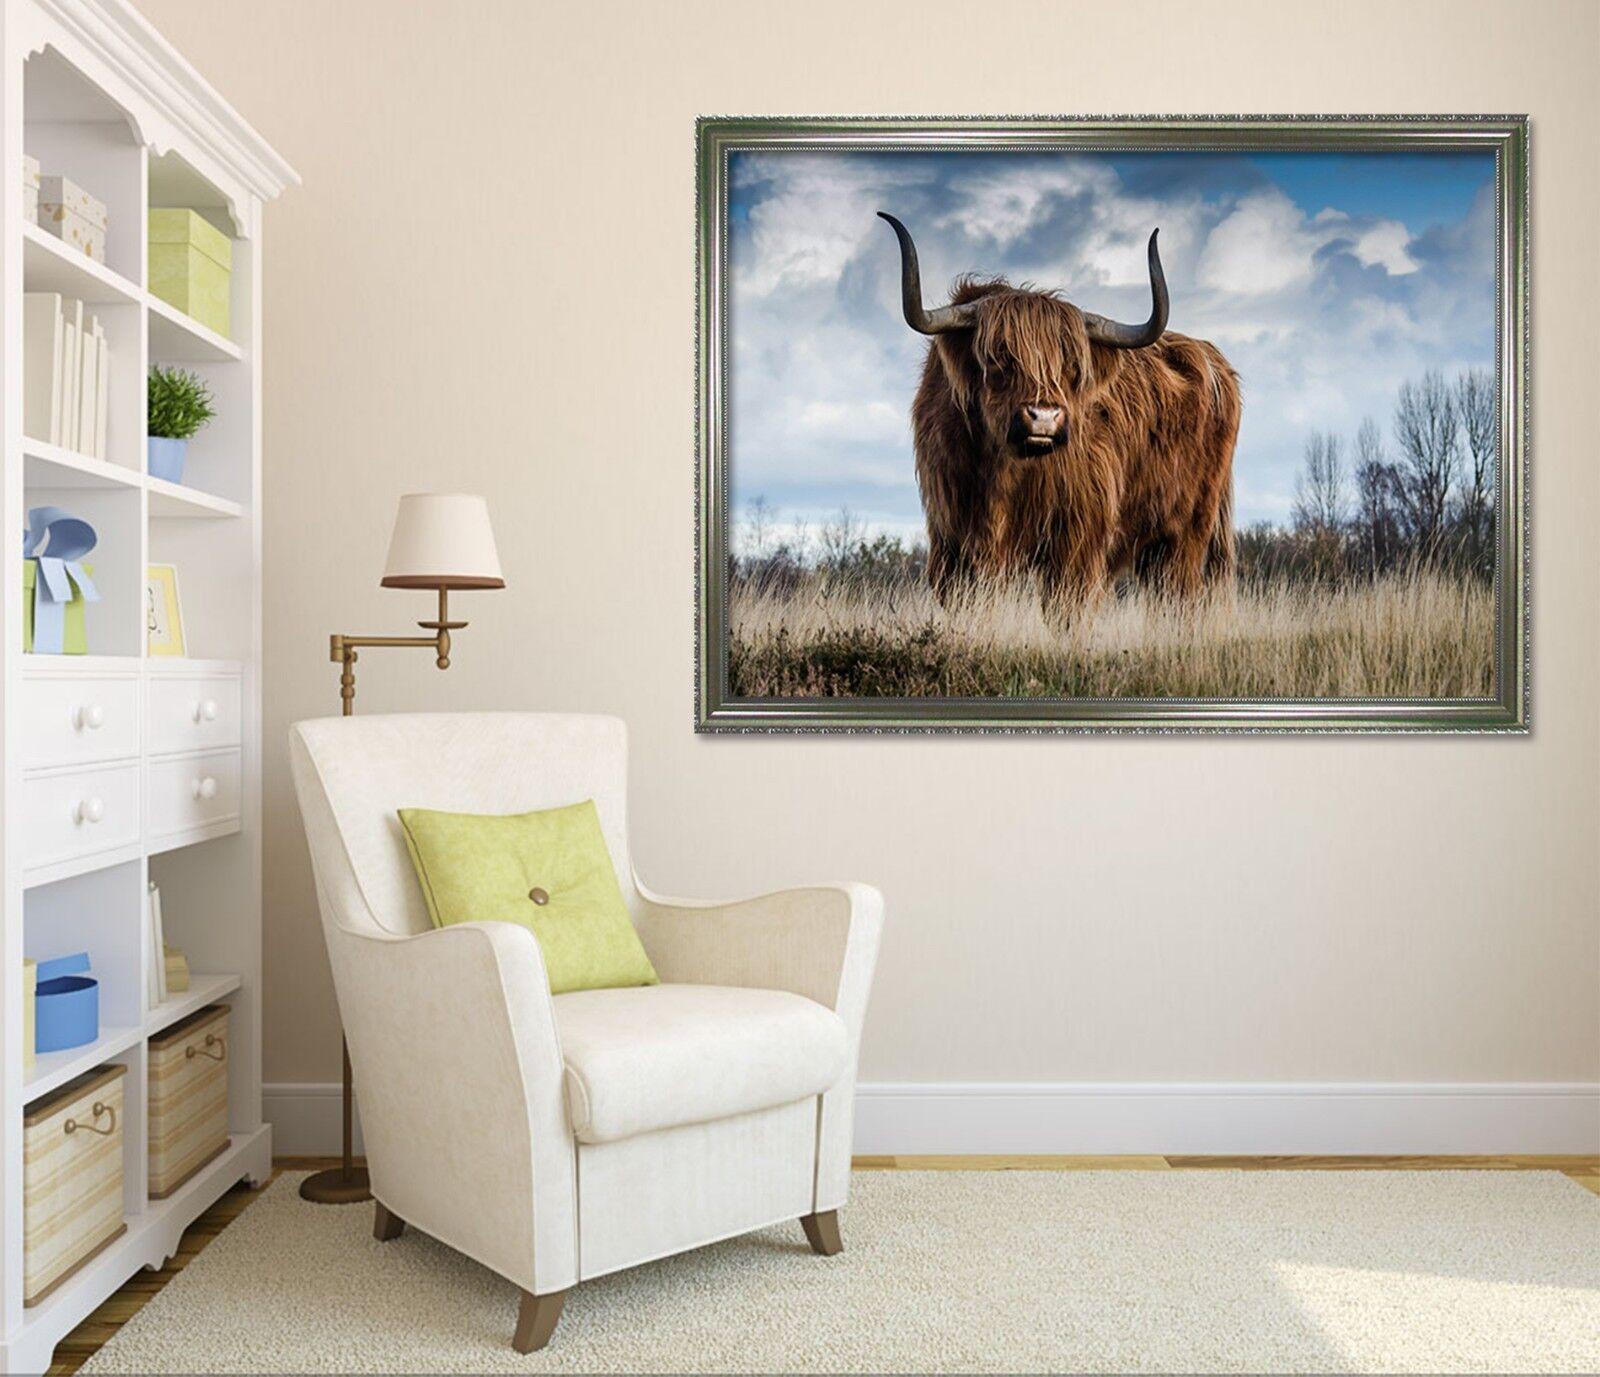 3D Big Goat 6 Framed Poster Home Decor Print Painting Art AJ WALLPAPER